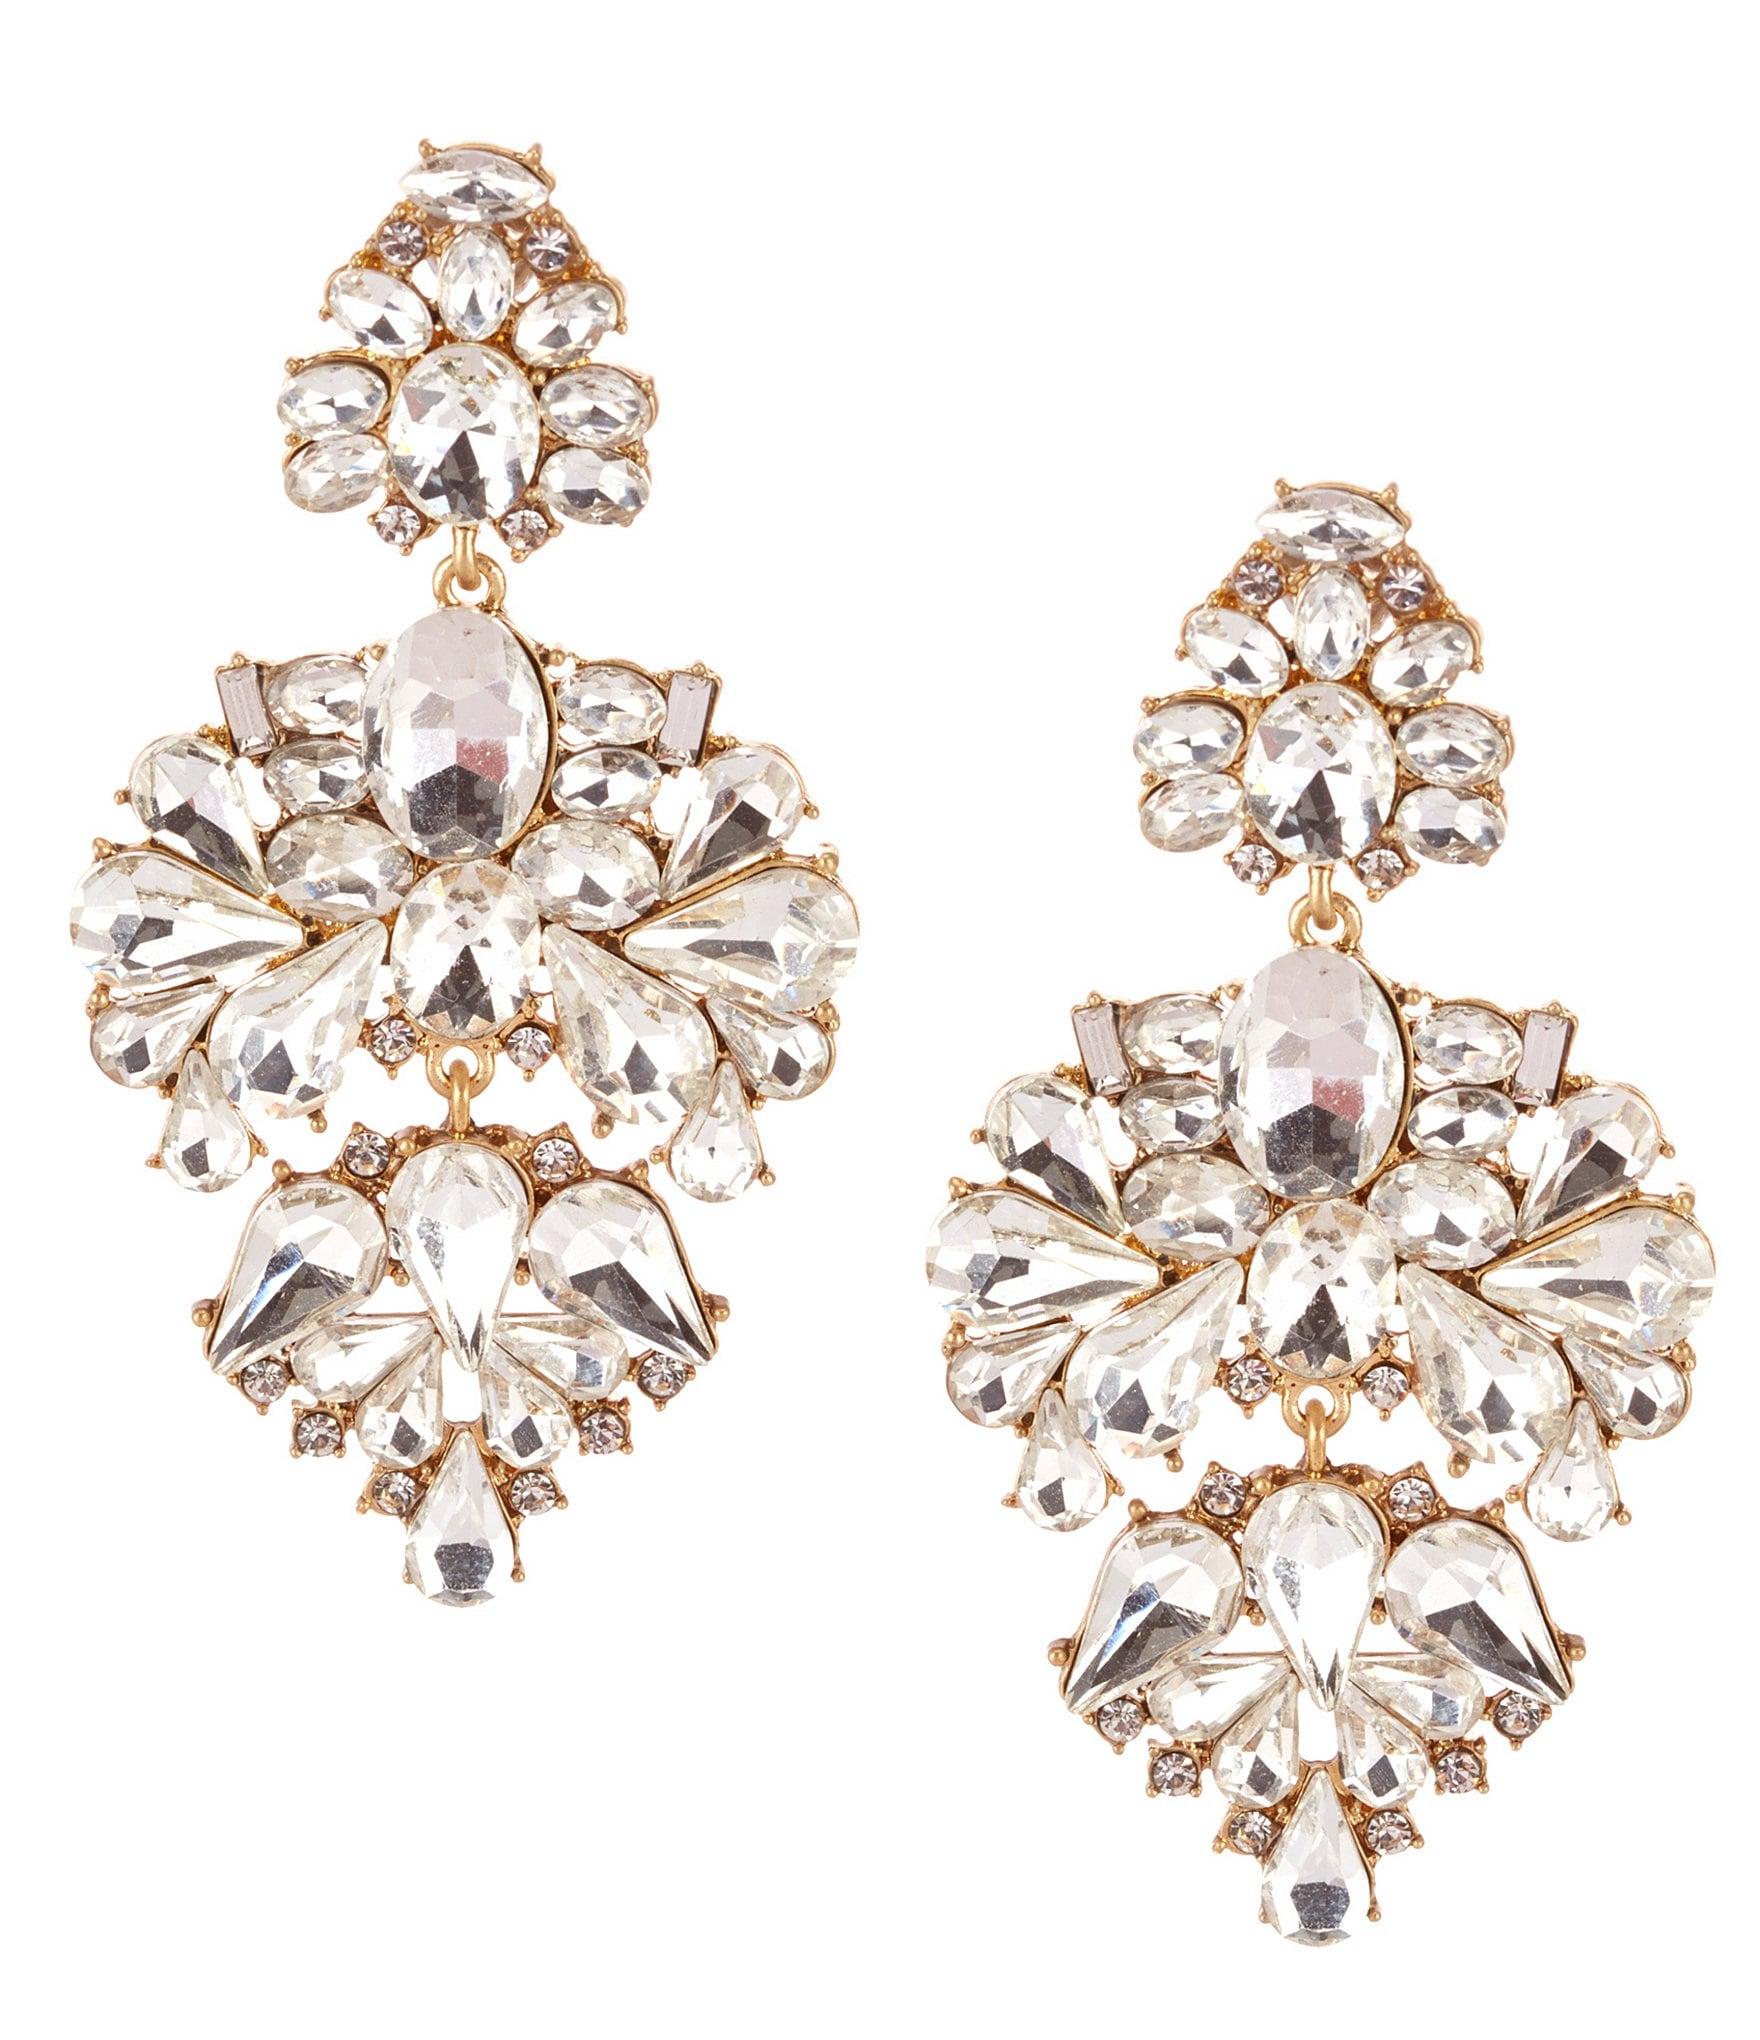 Accessories | Jewelry | Bridal Jewelry | Earrings | Dillards.com